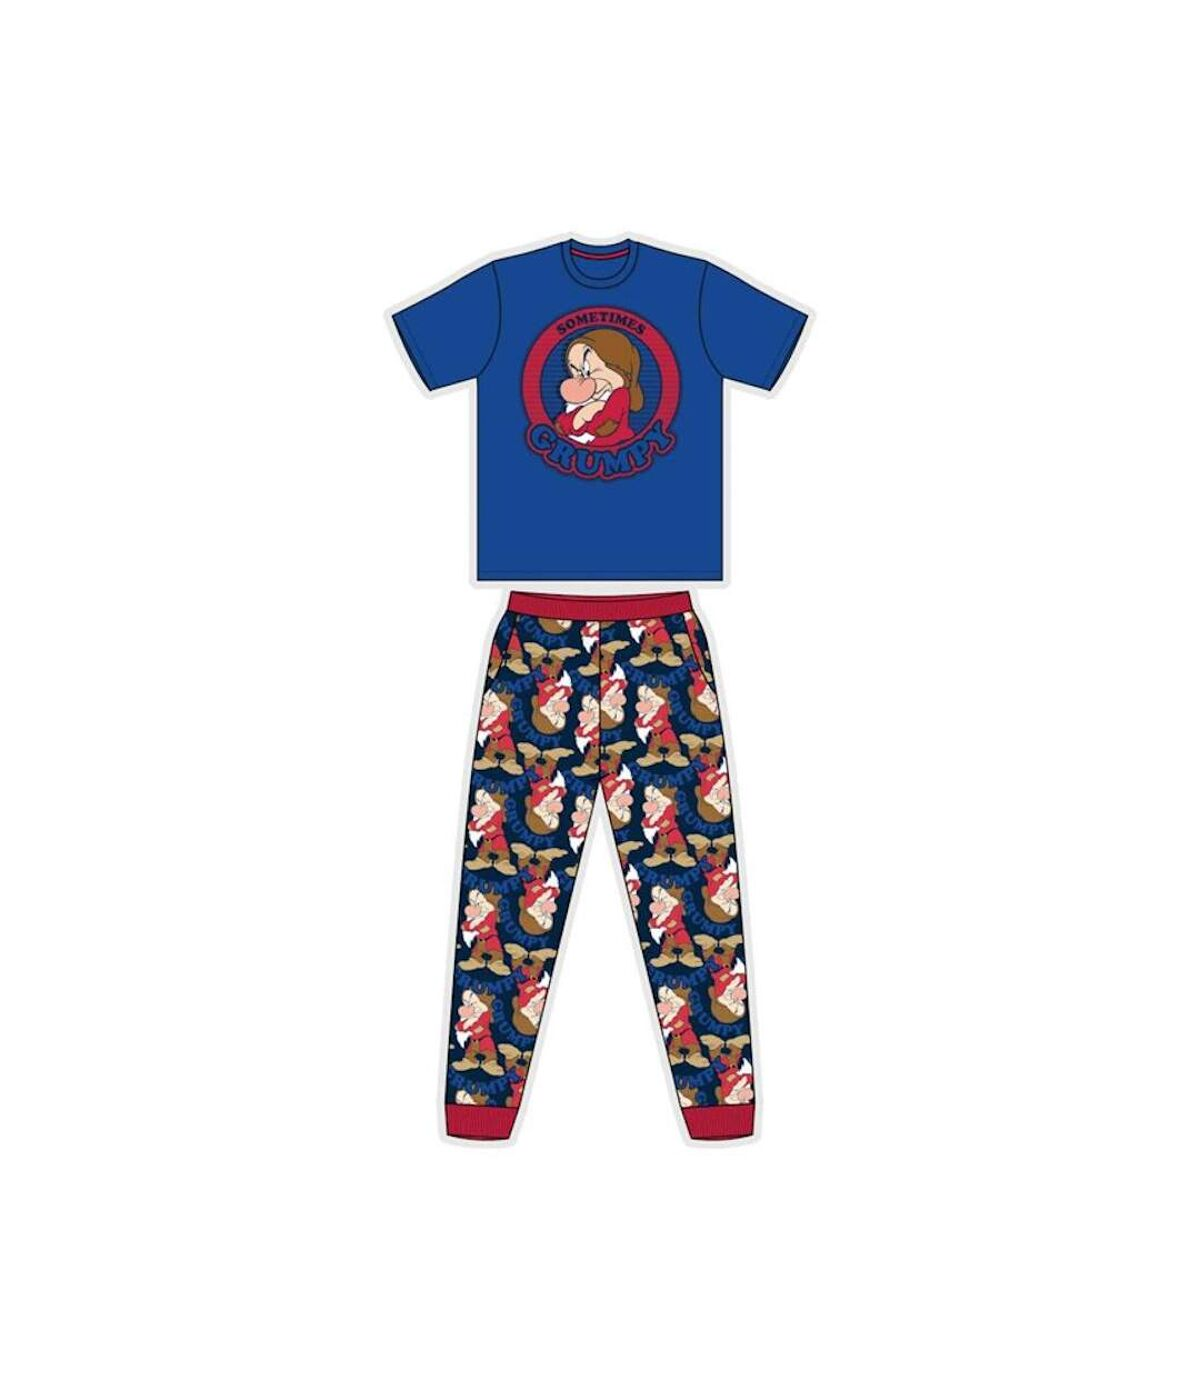 Snow White Mens Grumpy Short-Sleeved Pyjamas (Navy/Red) - UTUT619